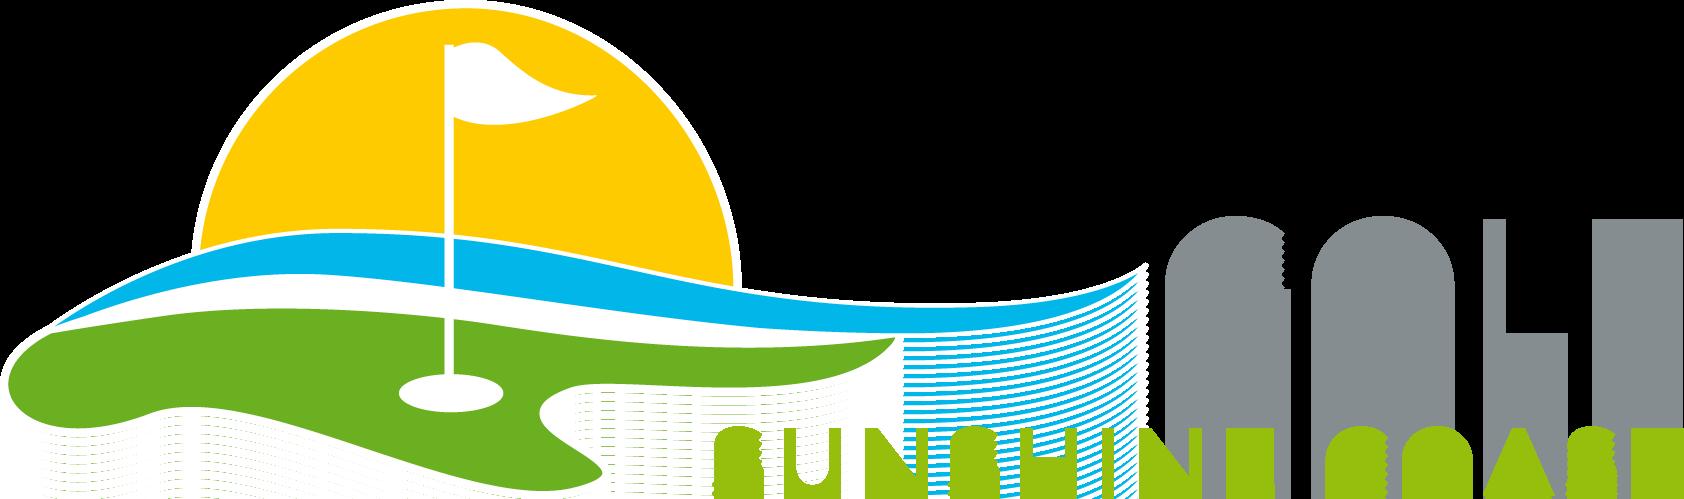 Golf Sunshine Coast